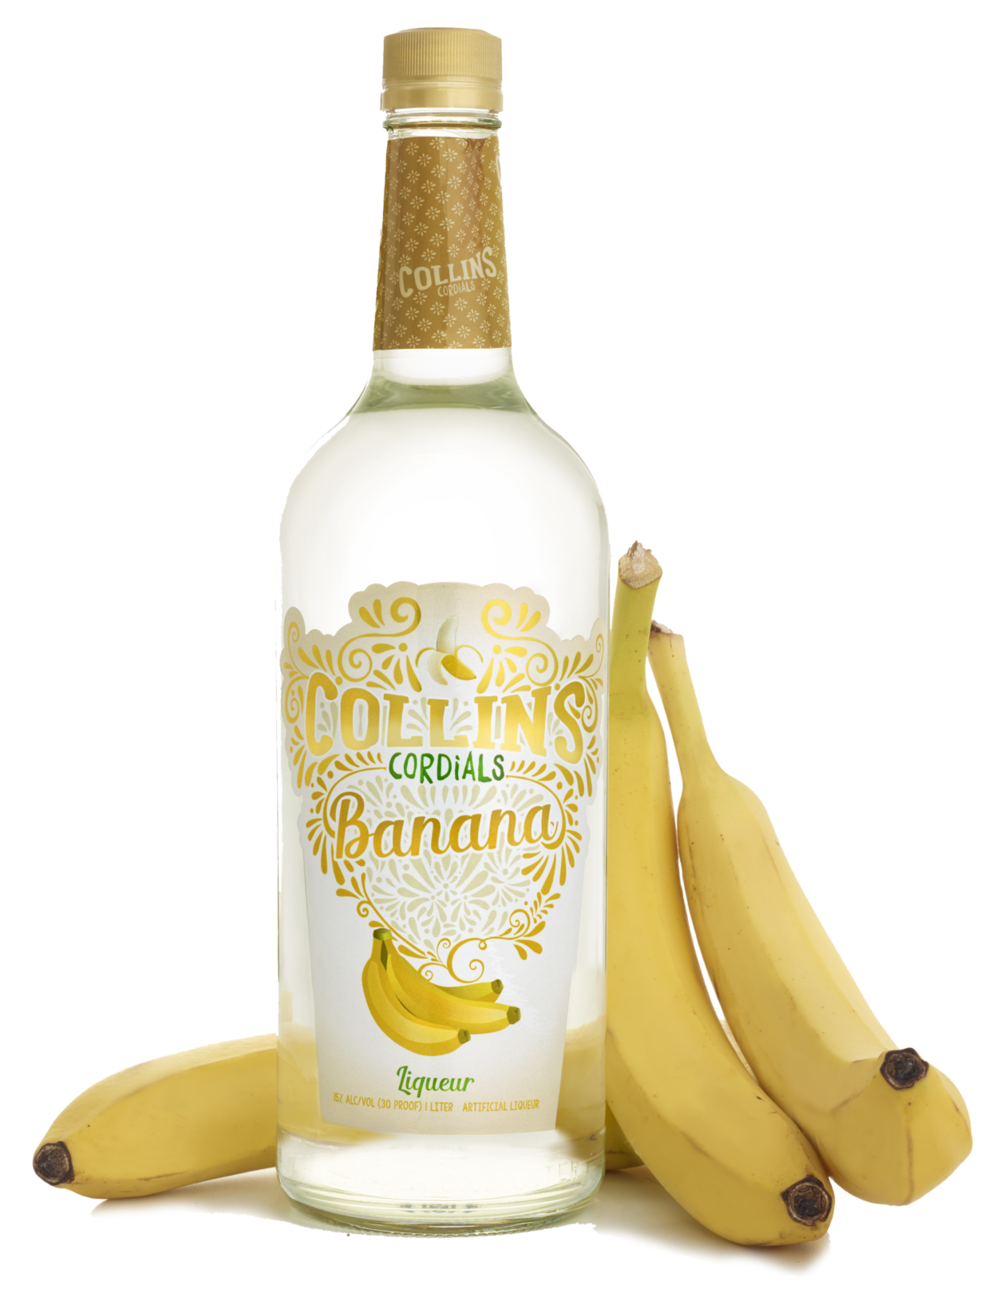 Banana liqueur collins cordials. Cocktail clipart liqour